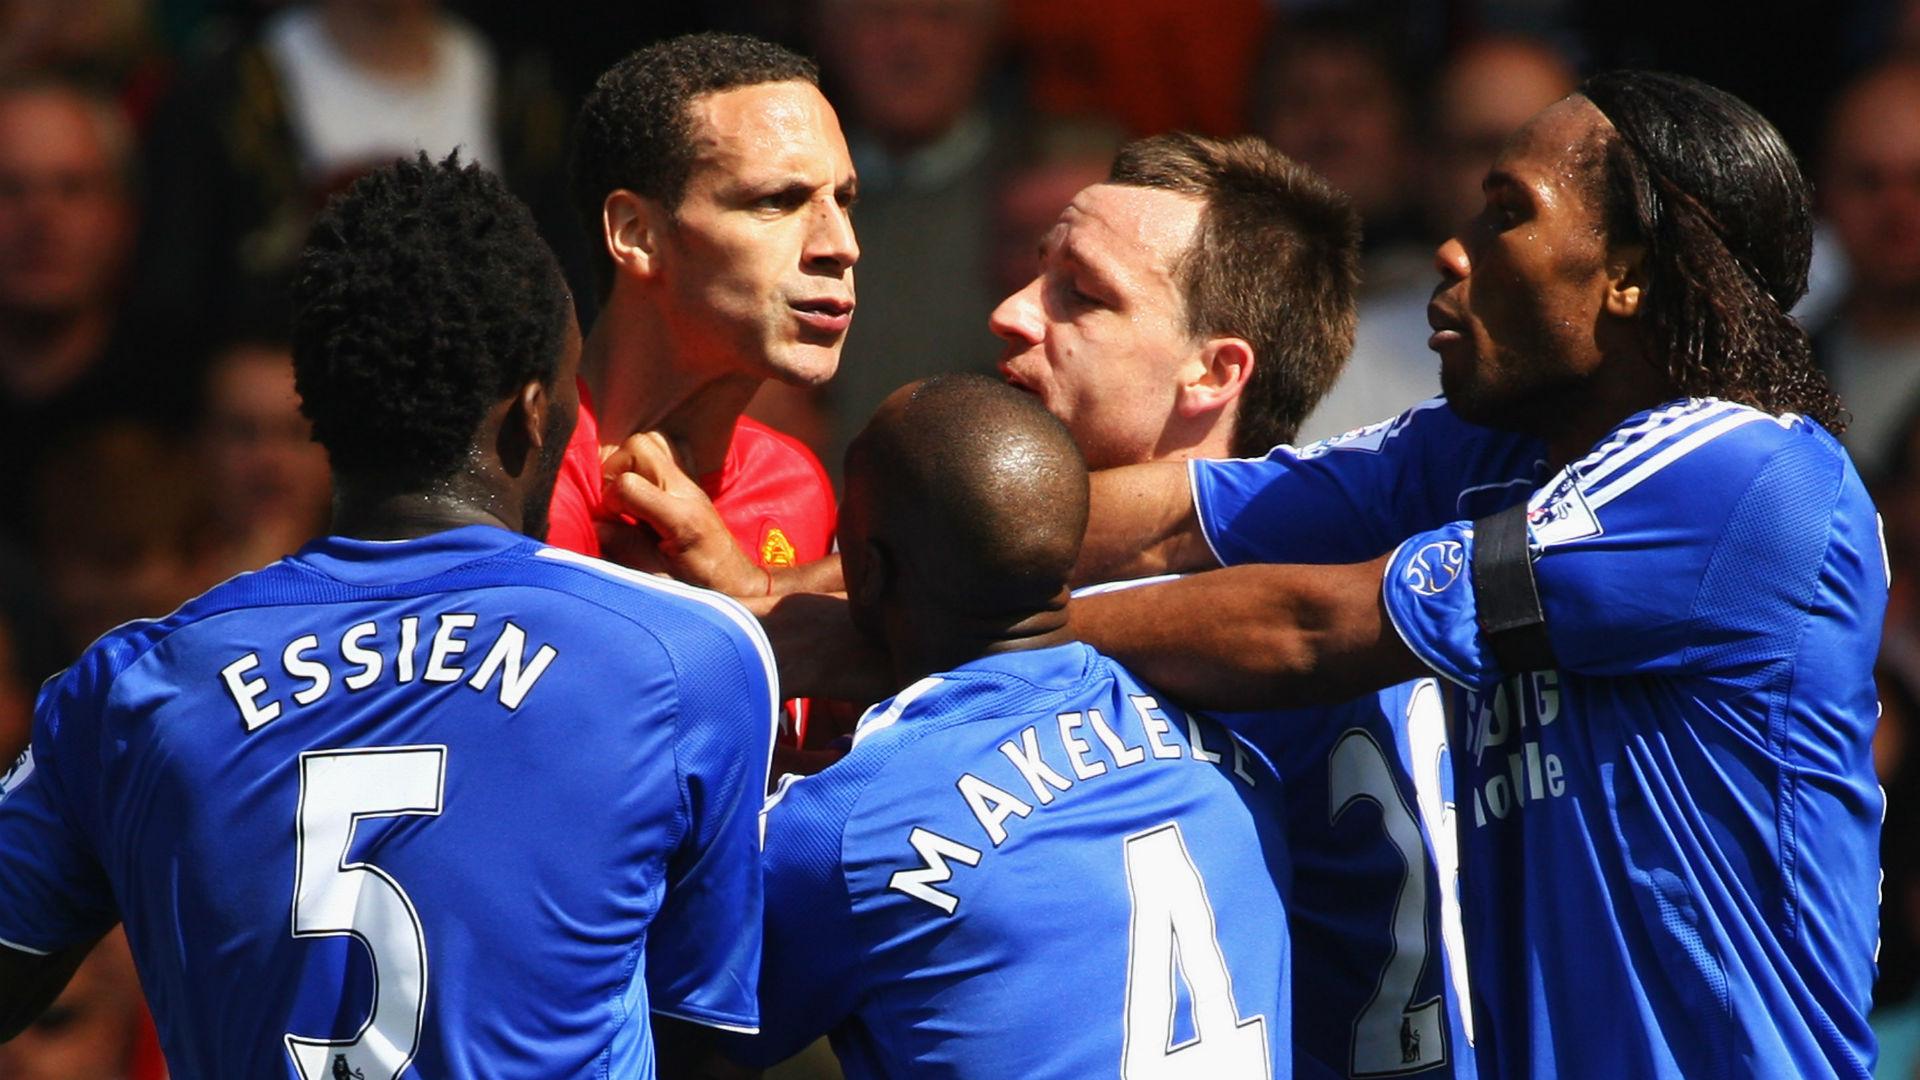 Rio Ferdinand Manchester United Didier Drogba Chelsea 2008